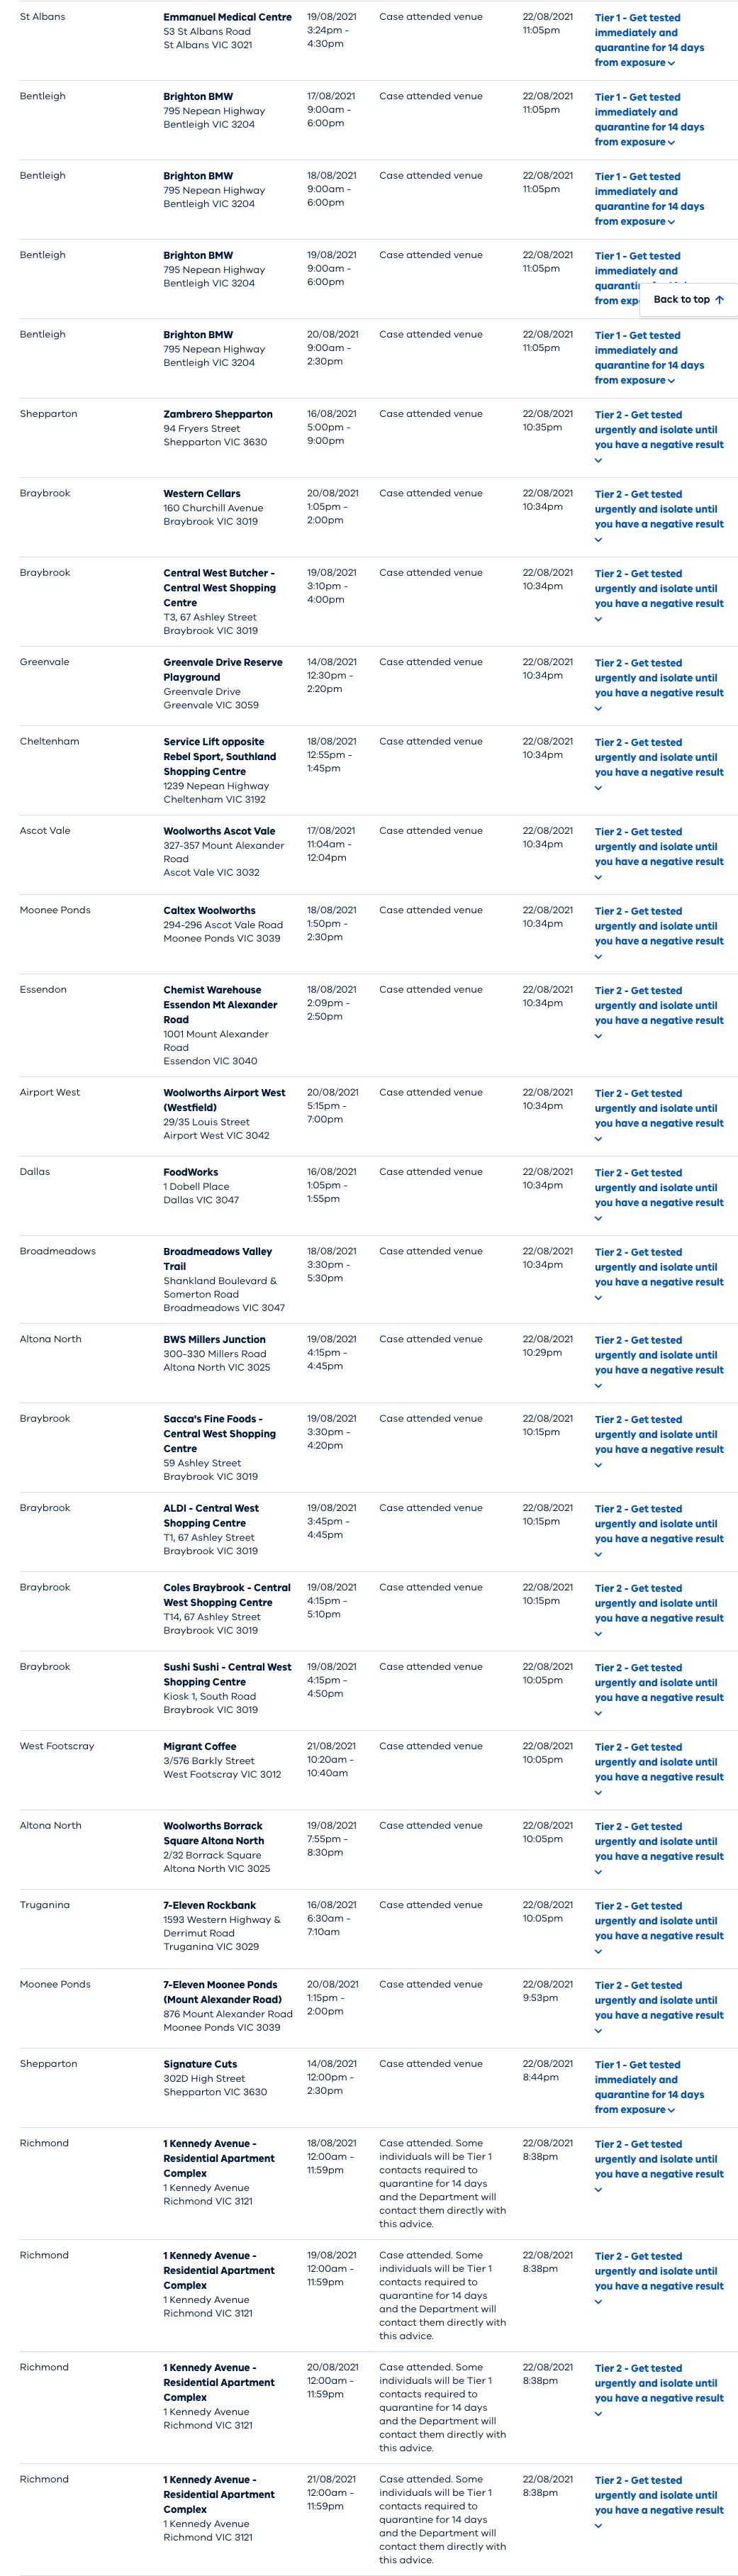 www.coronavirus.vic.gov.au_exposure-sites (36).png